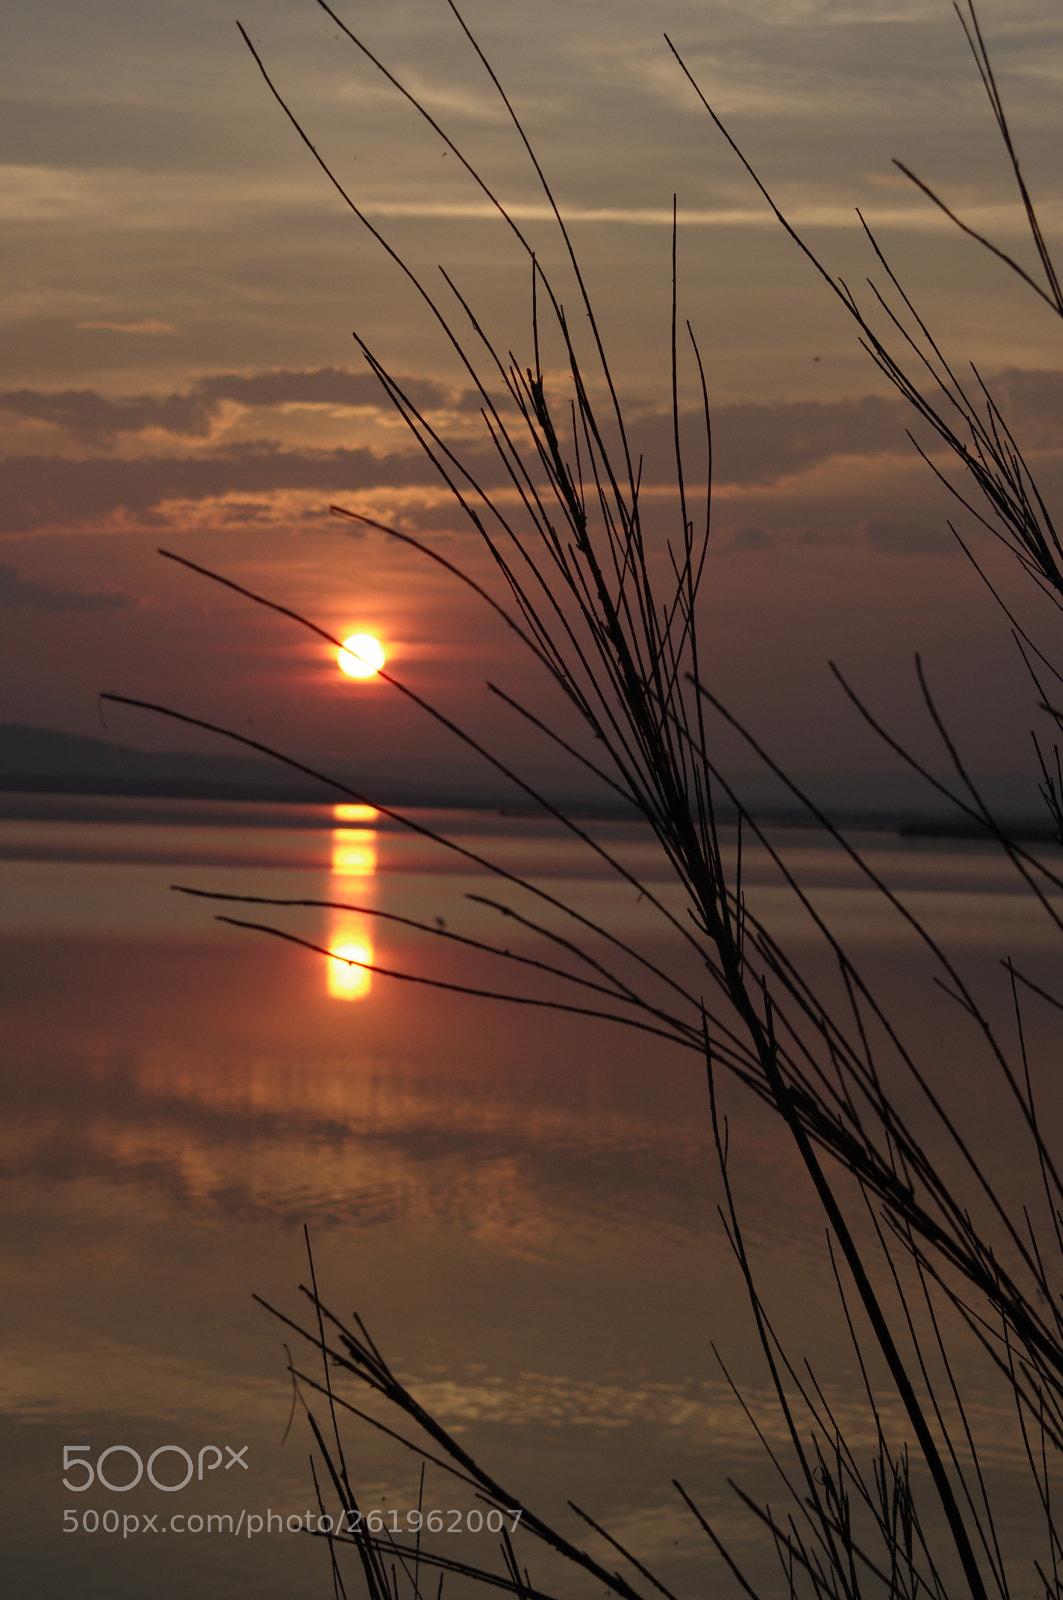 Sunset-1, Pentax K-R, smc PENTAX-F 35-70mm F3.5-4.5